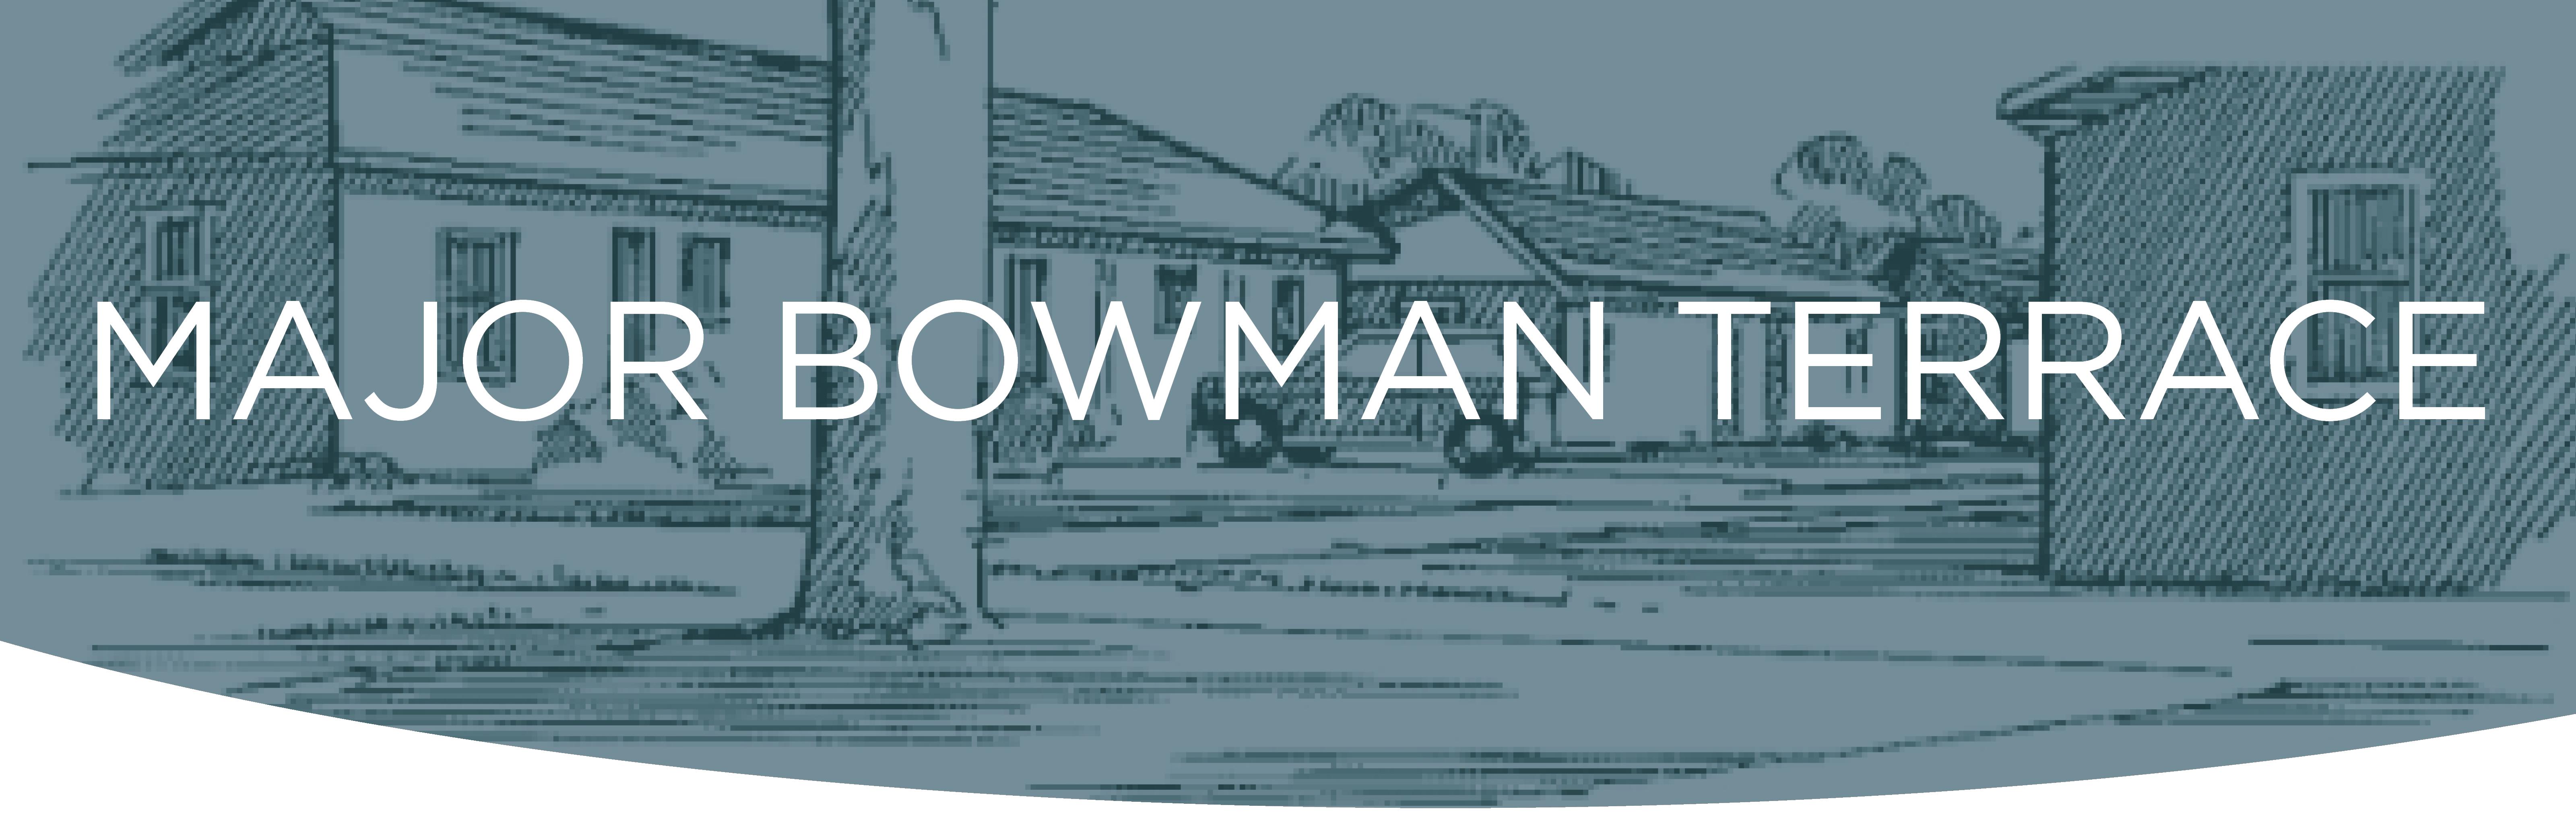 major bowman terrance header